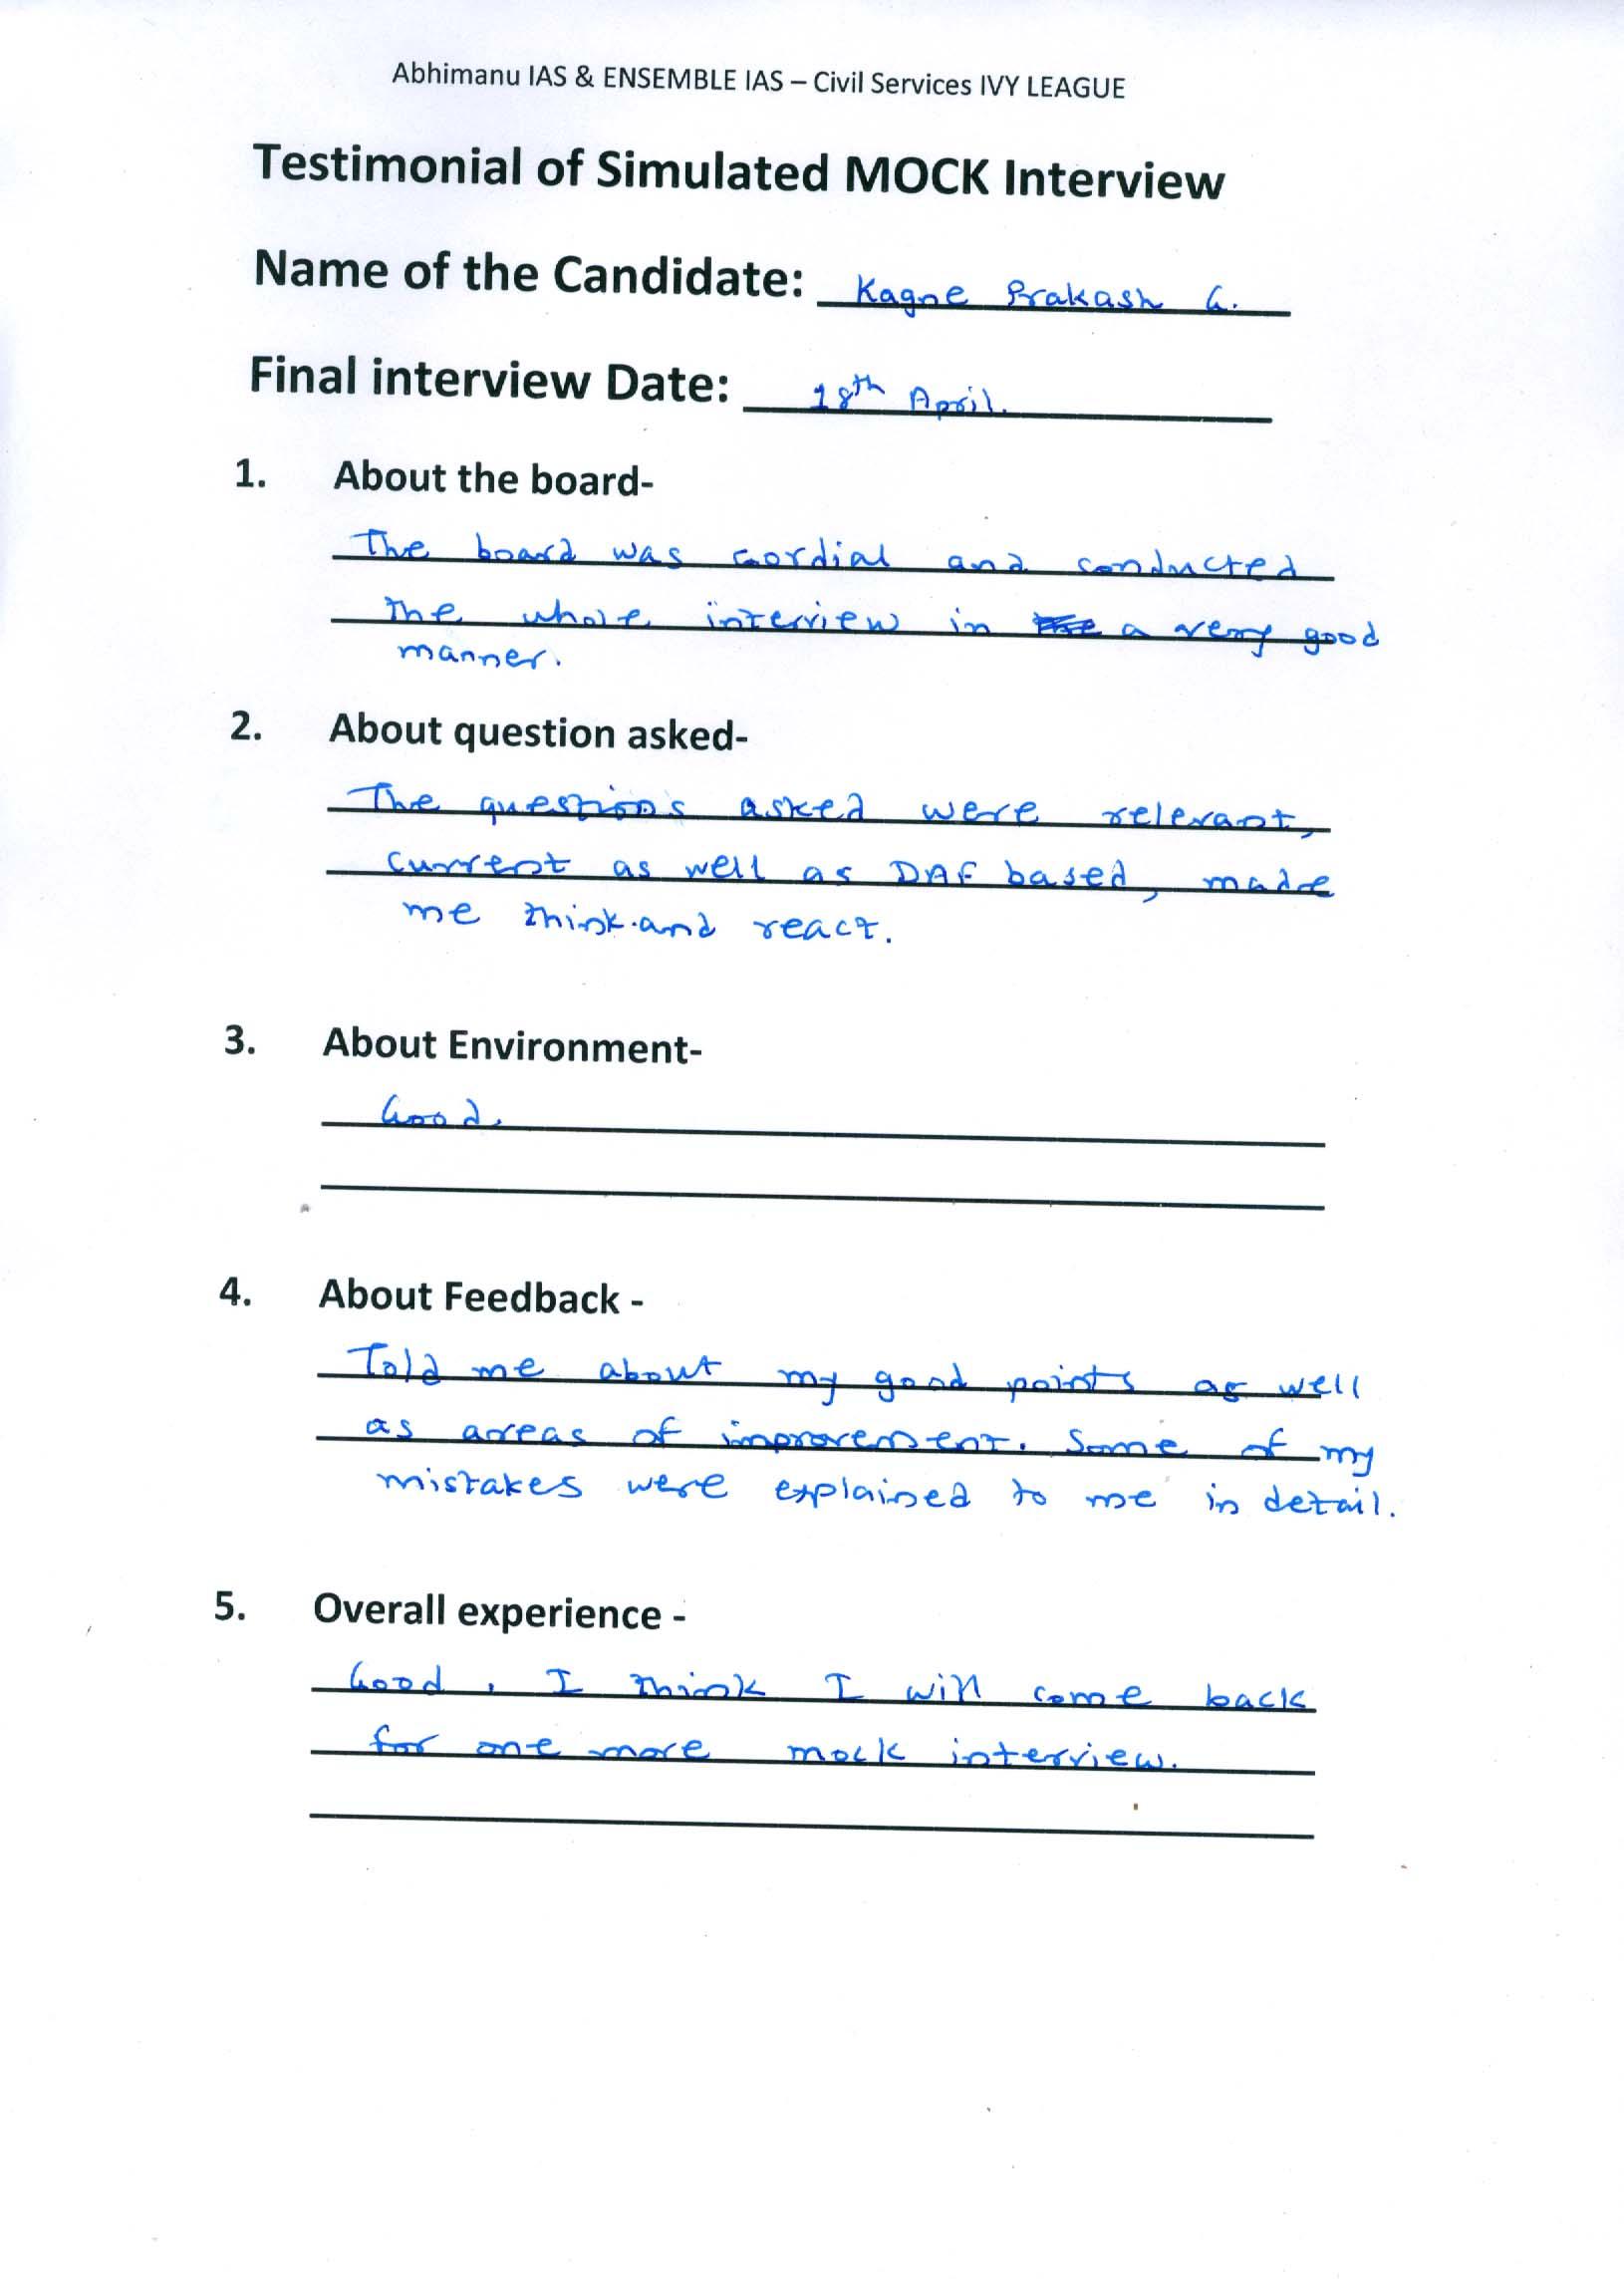 Interview Testimonial By- Kagne Prakash